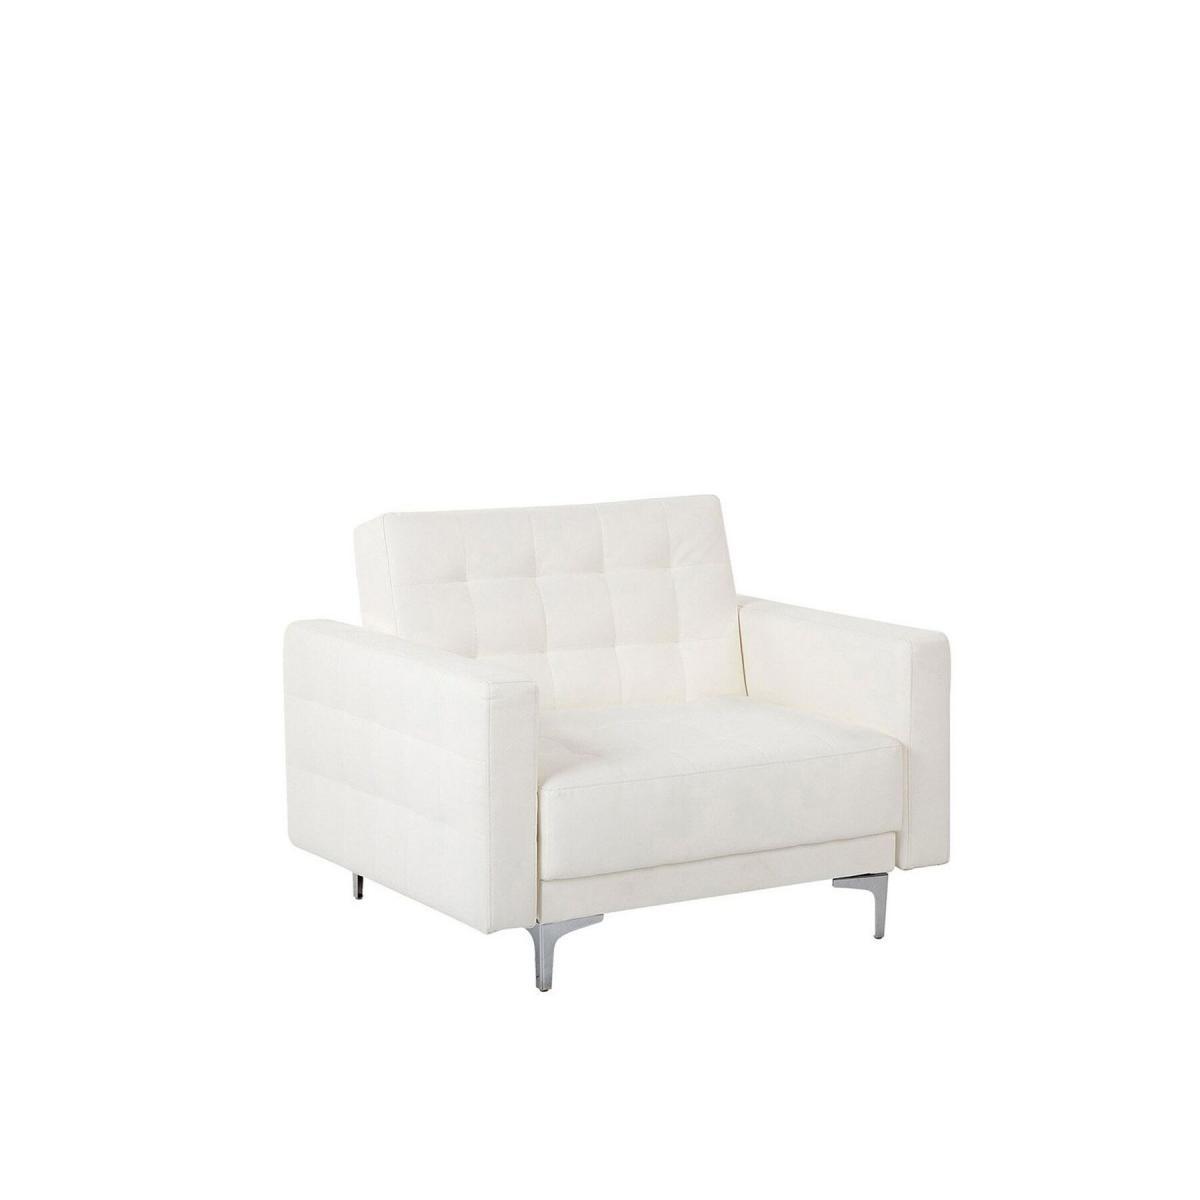 Beliani Beliani Fauteuil en simili-cuir blanc ABERDEEN II - blanc